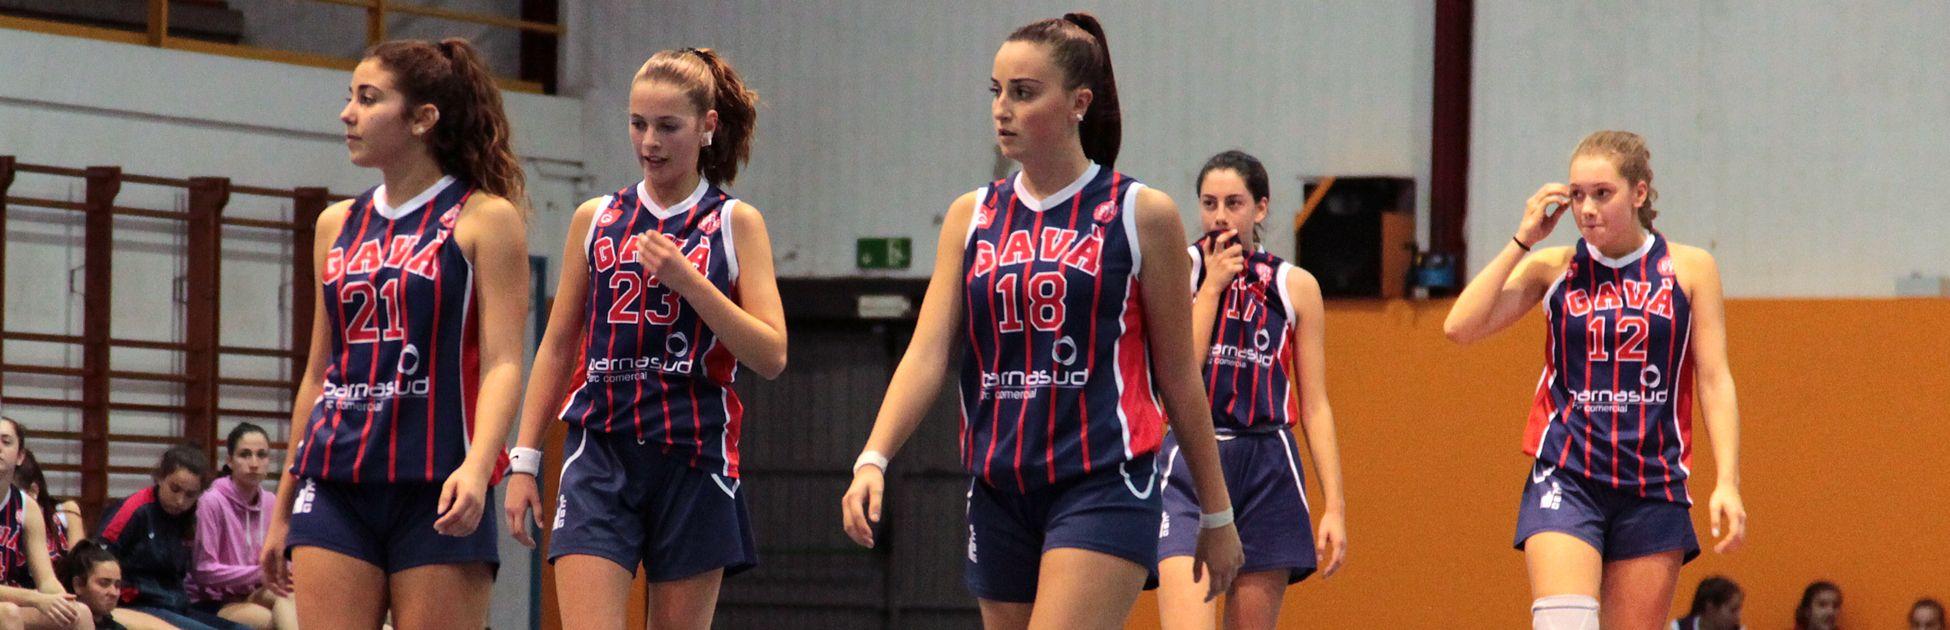 Club de basquet gava. equip femeni